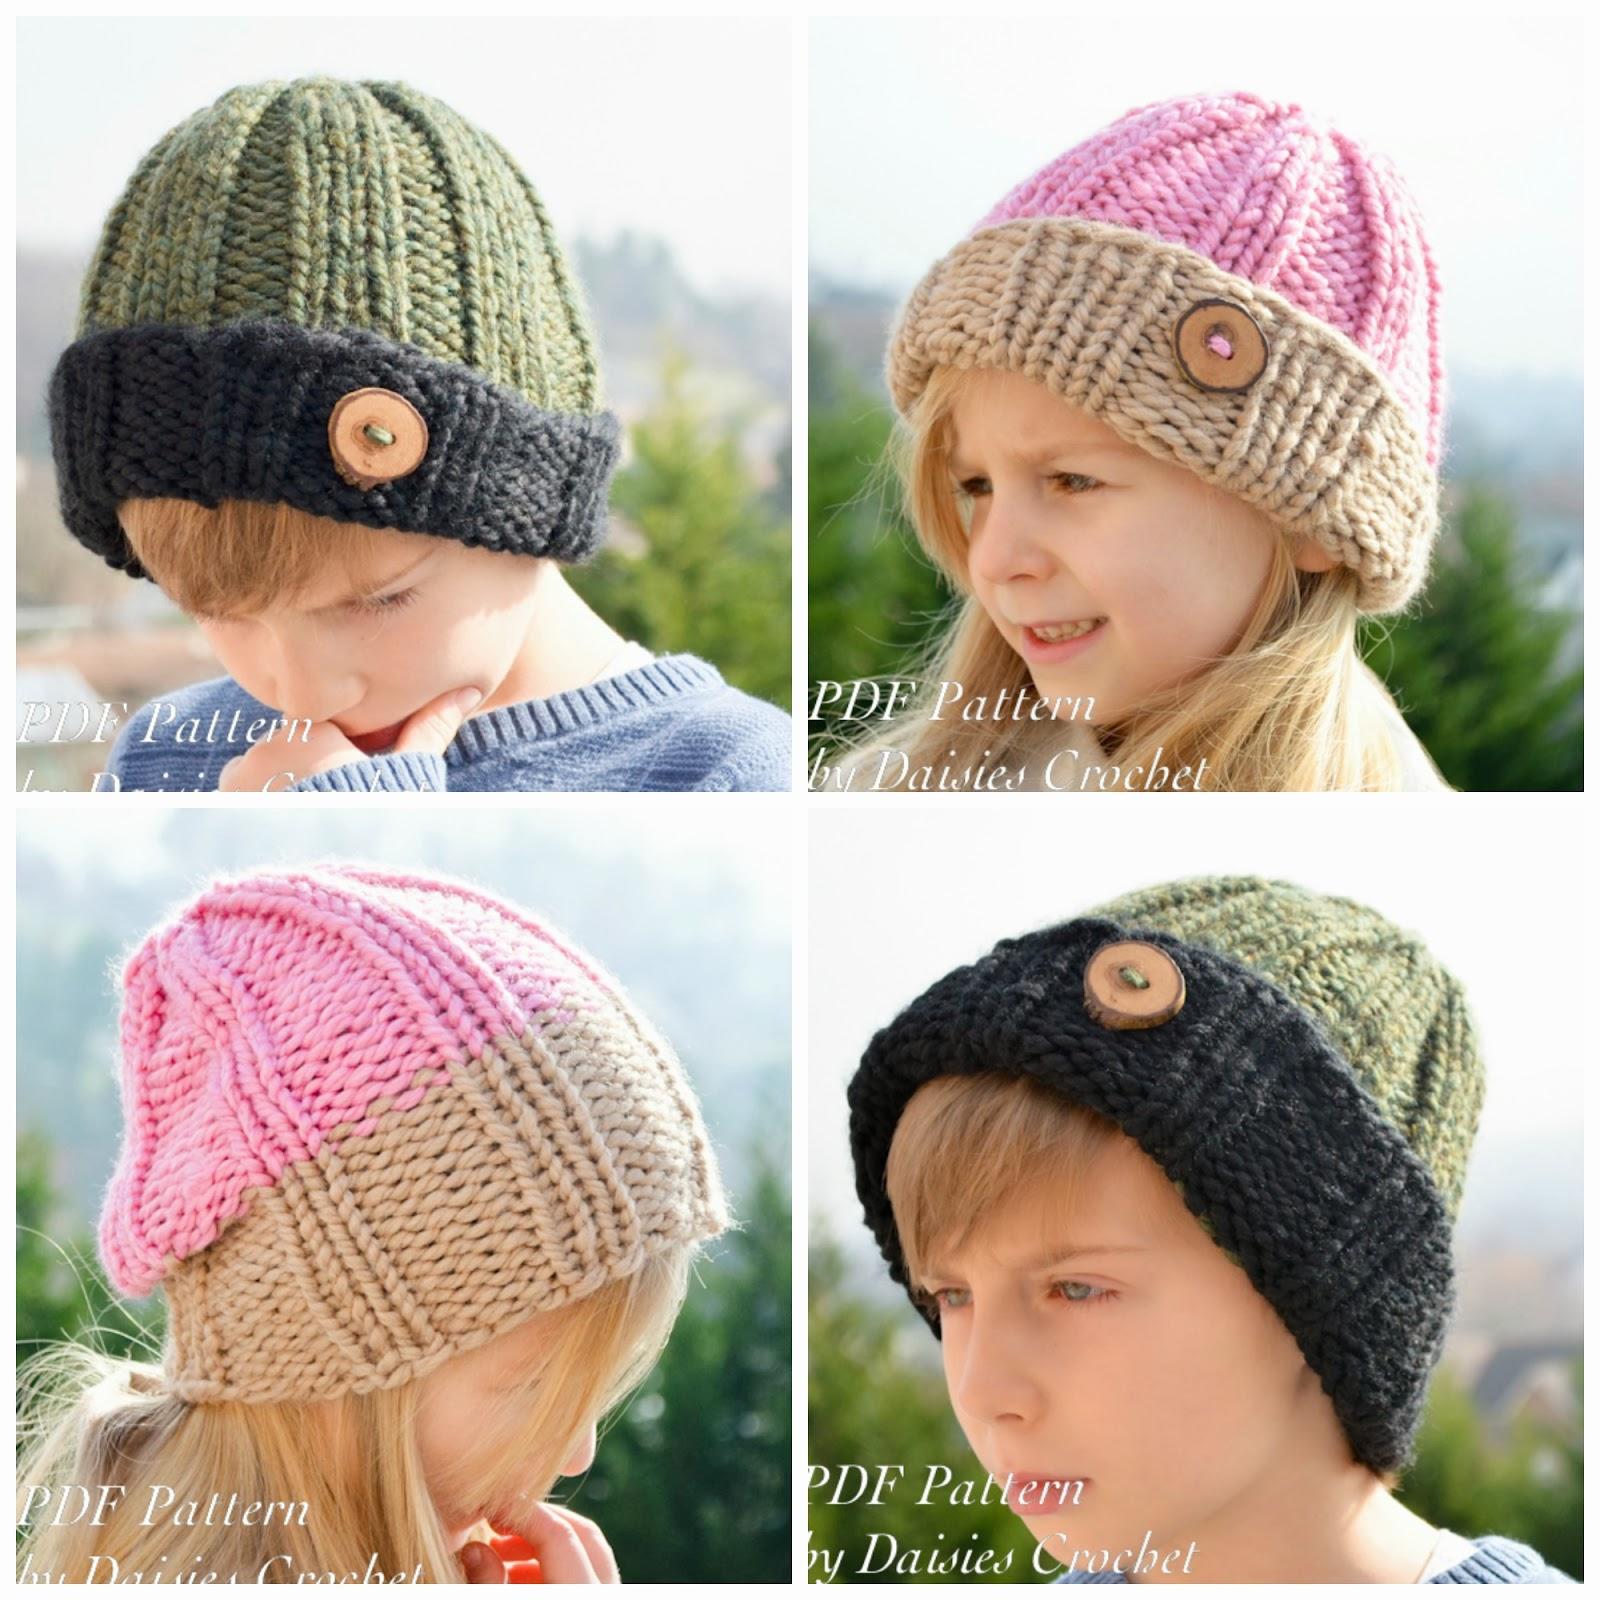 Daisies Crochet: Knitting pattern. Reversible beanie. Clomder hat ...